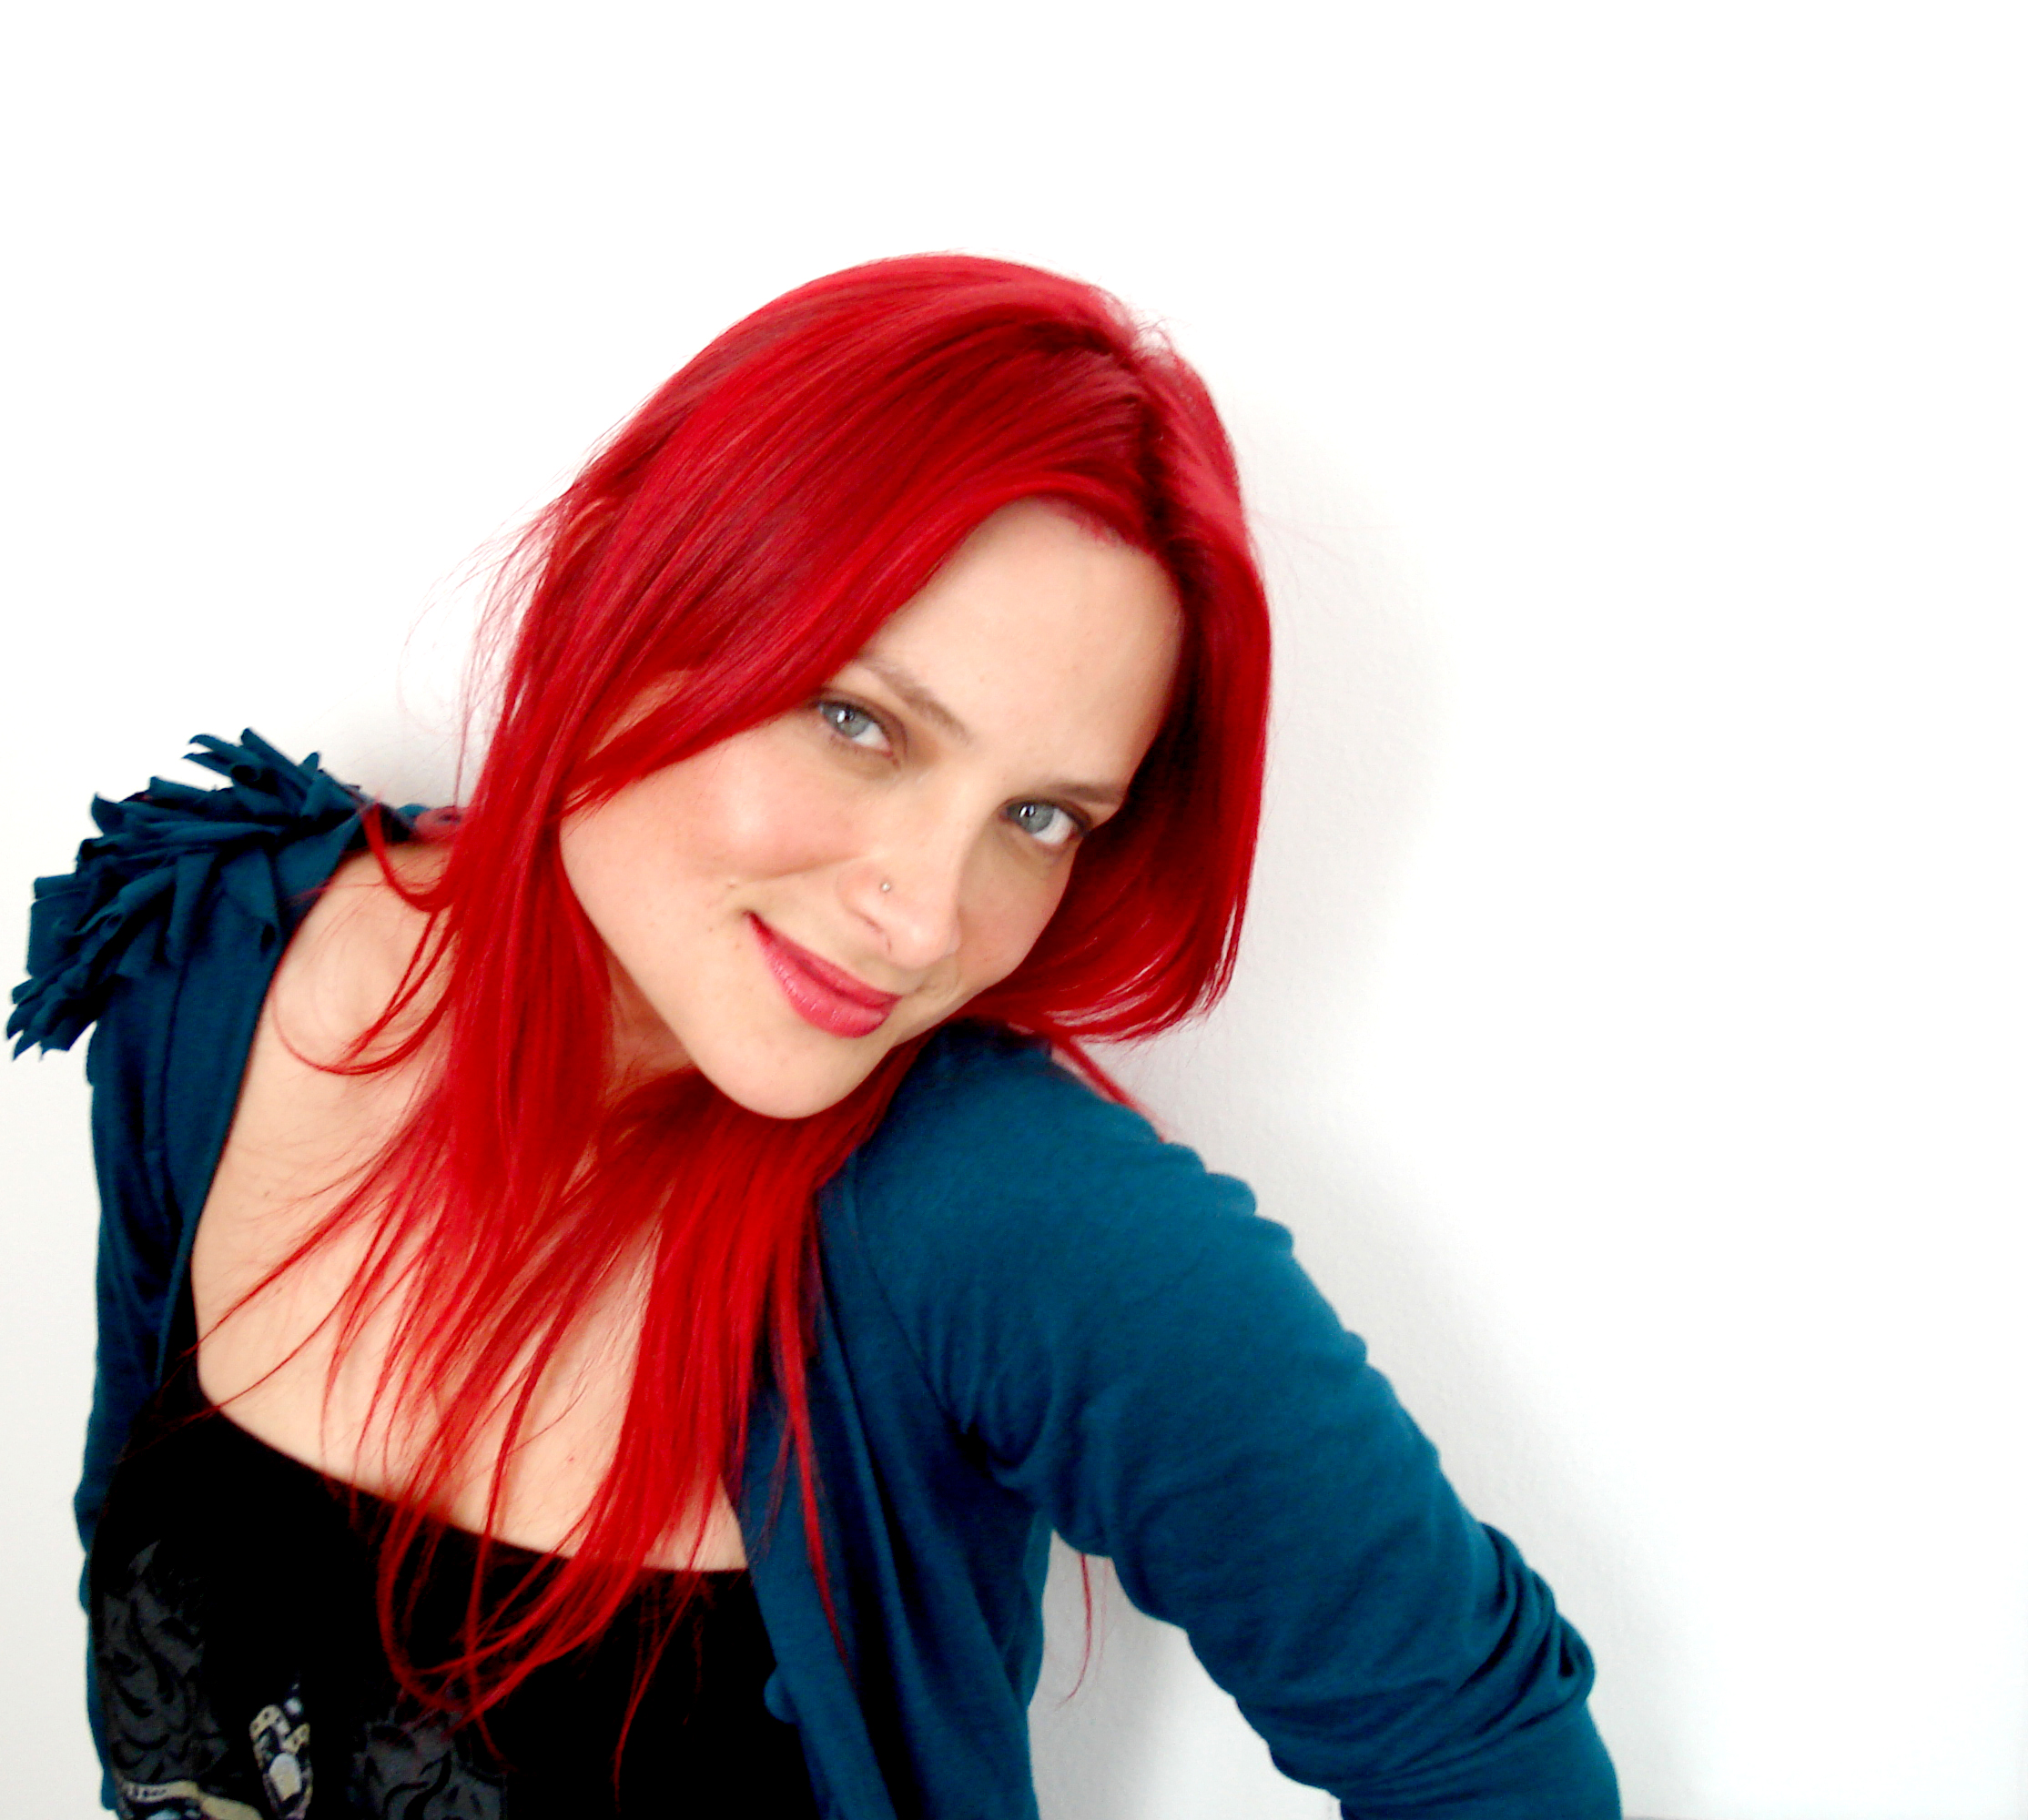 File:Nicole cantante 2.jpg - Wikipedia, the free encyclopedia